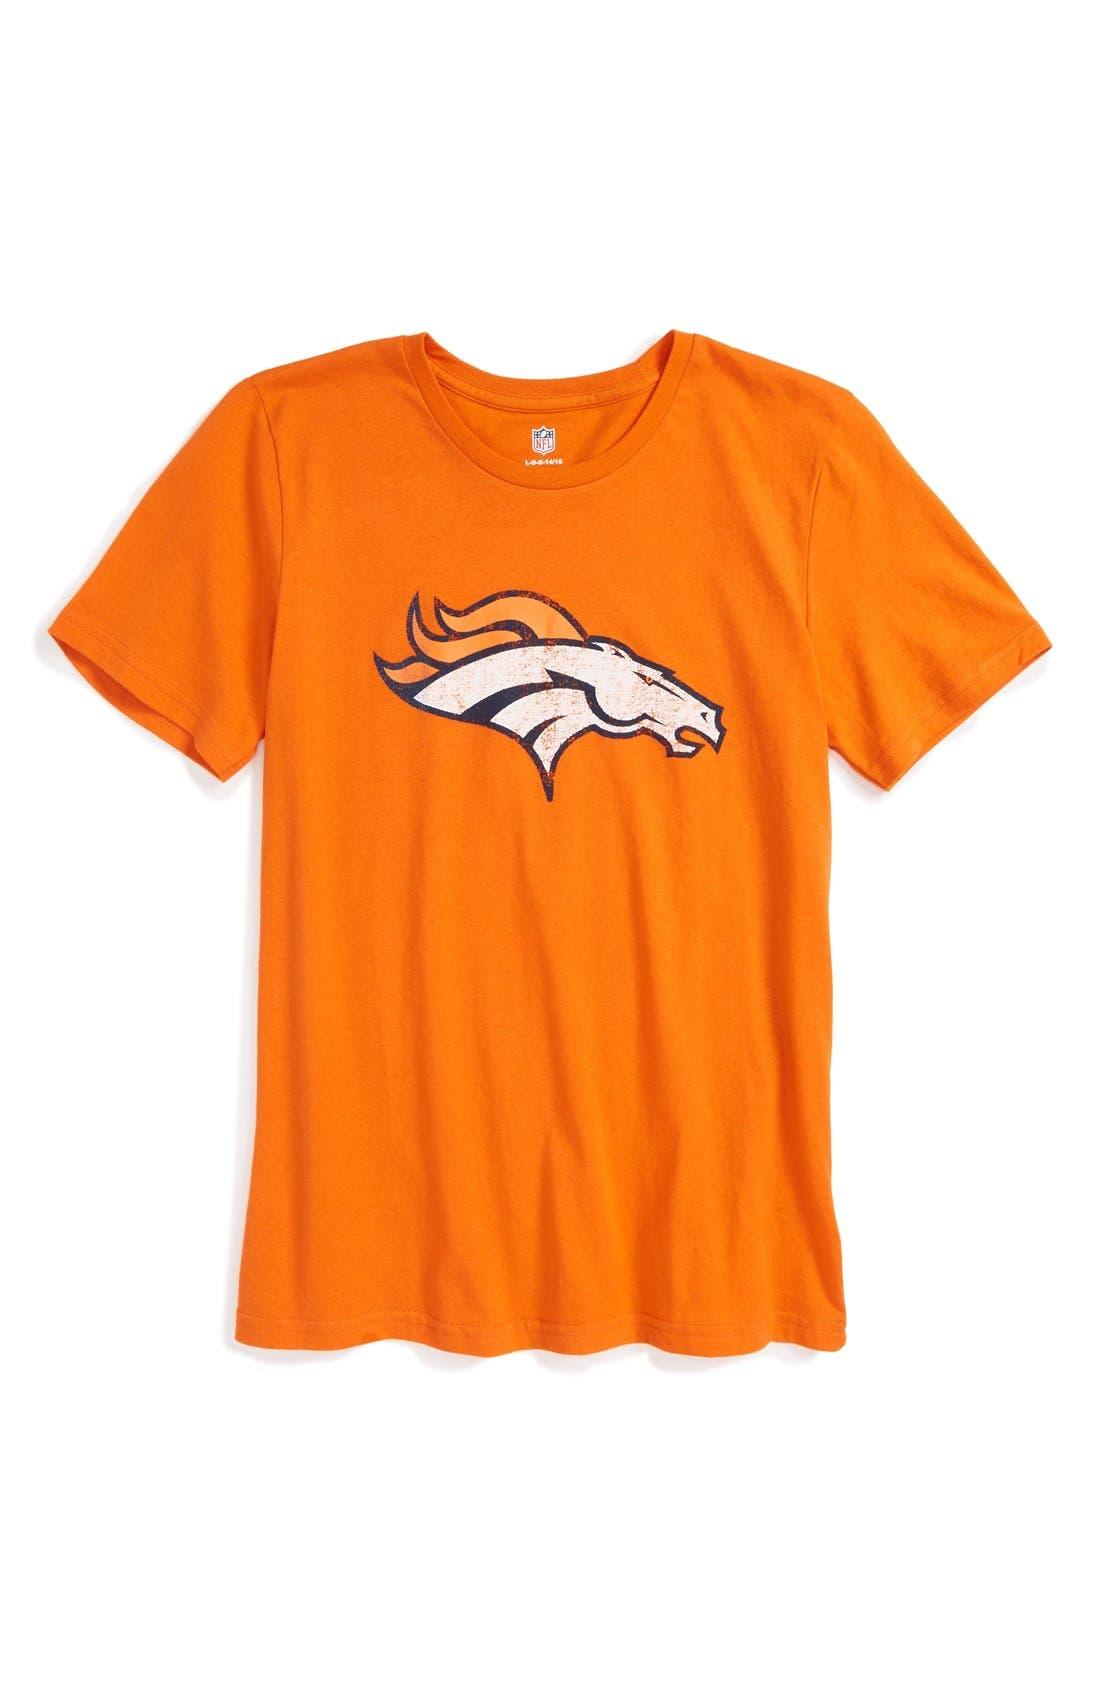 'NFL - Denver Broncos' Distressed Logo Graphic T-Shirt,                             Main thumbnail 1, color,                             800